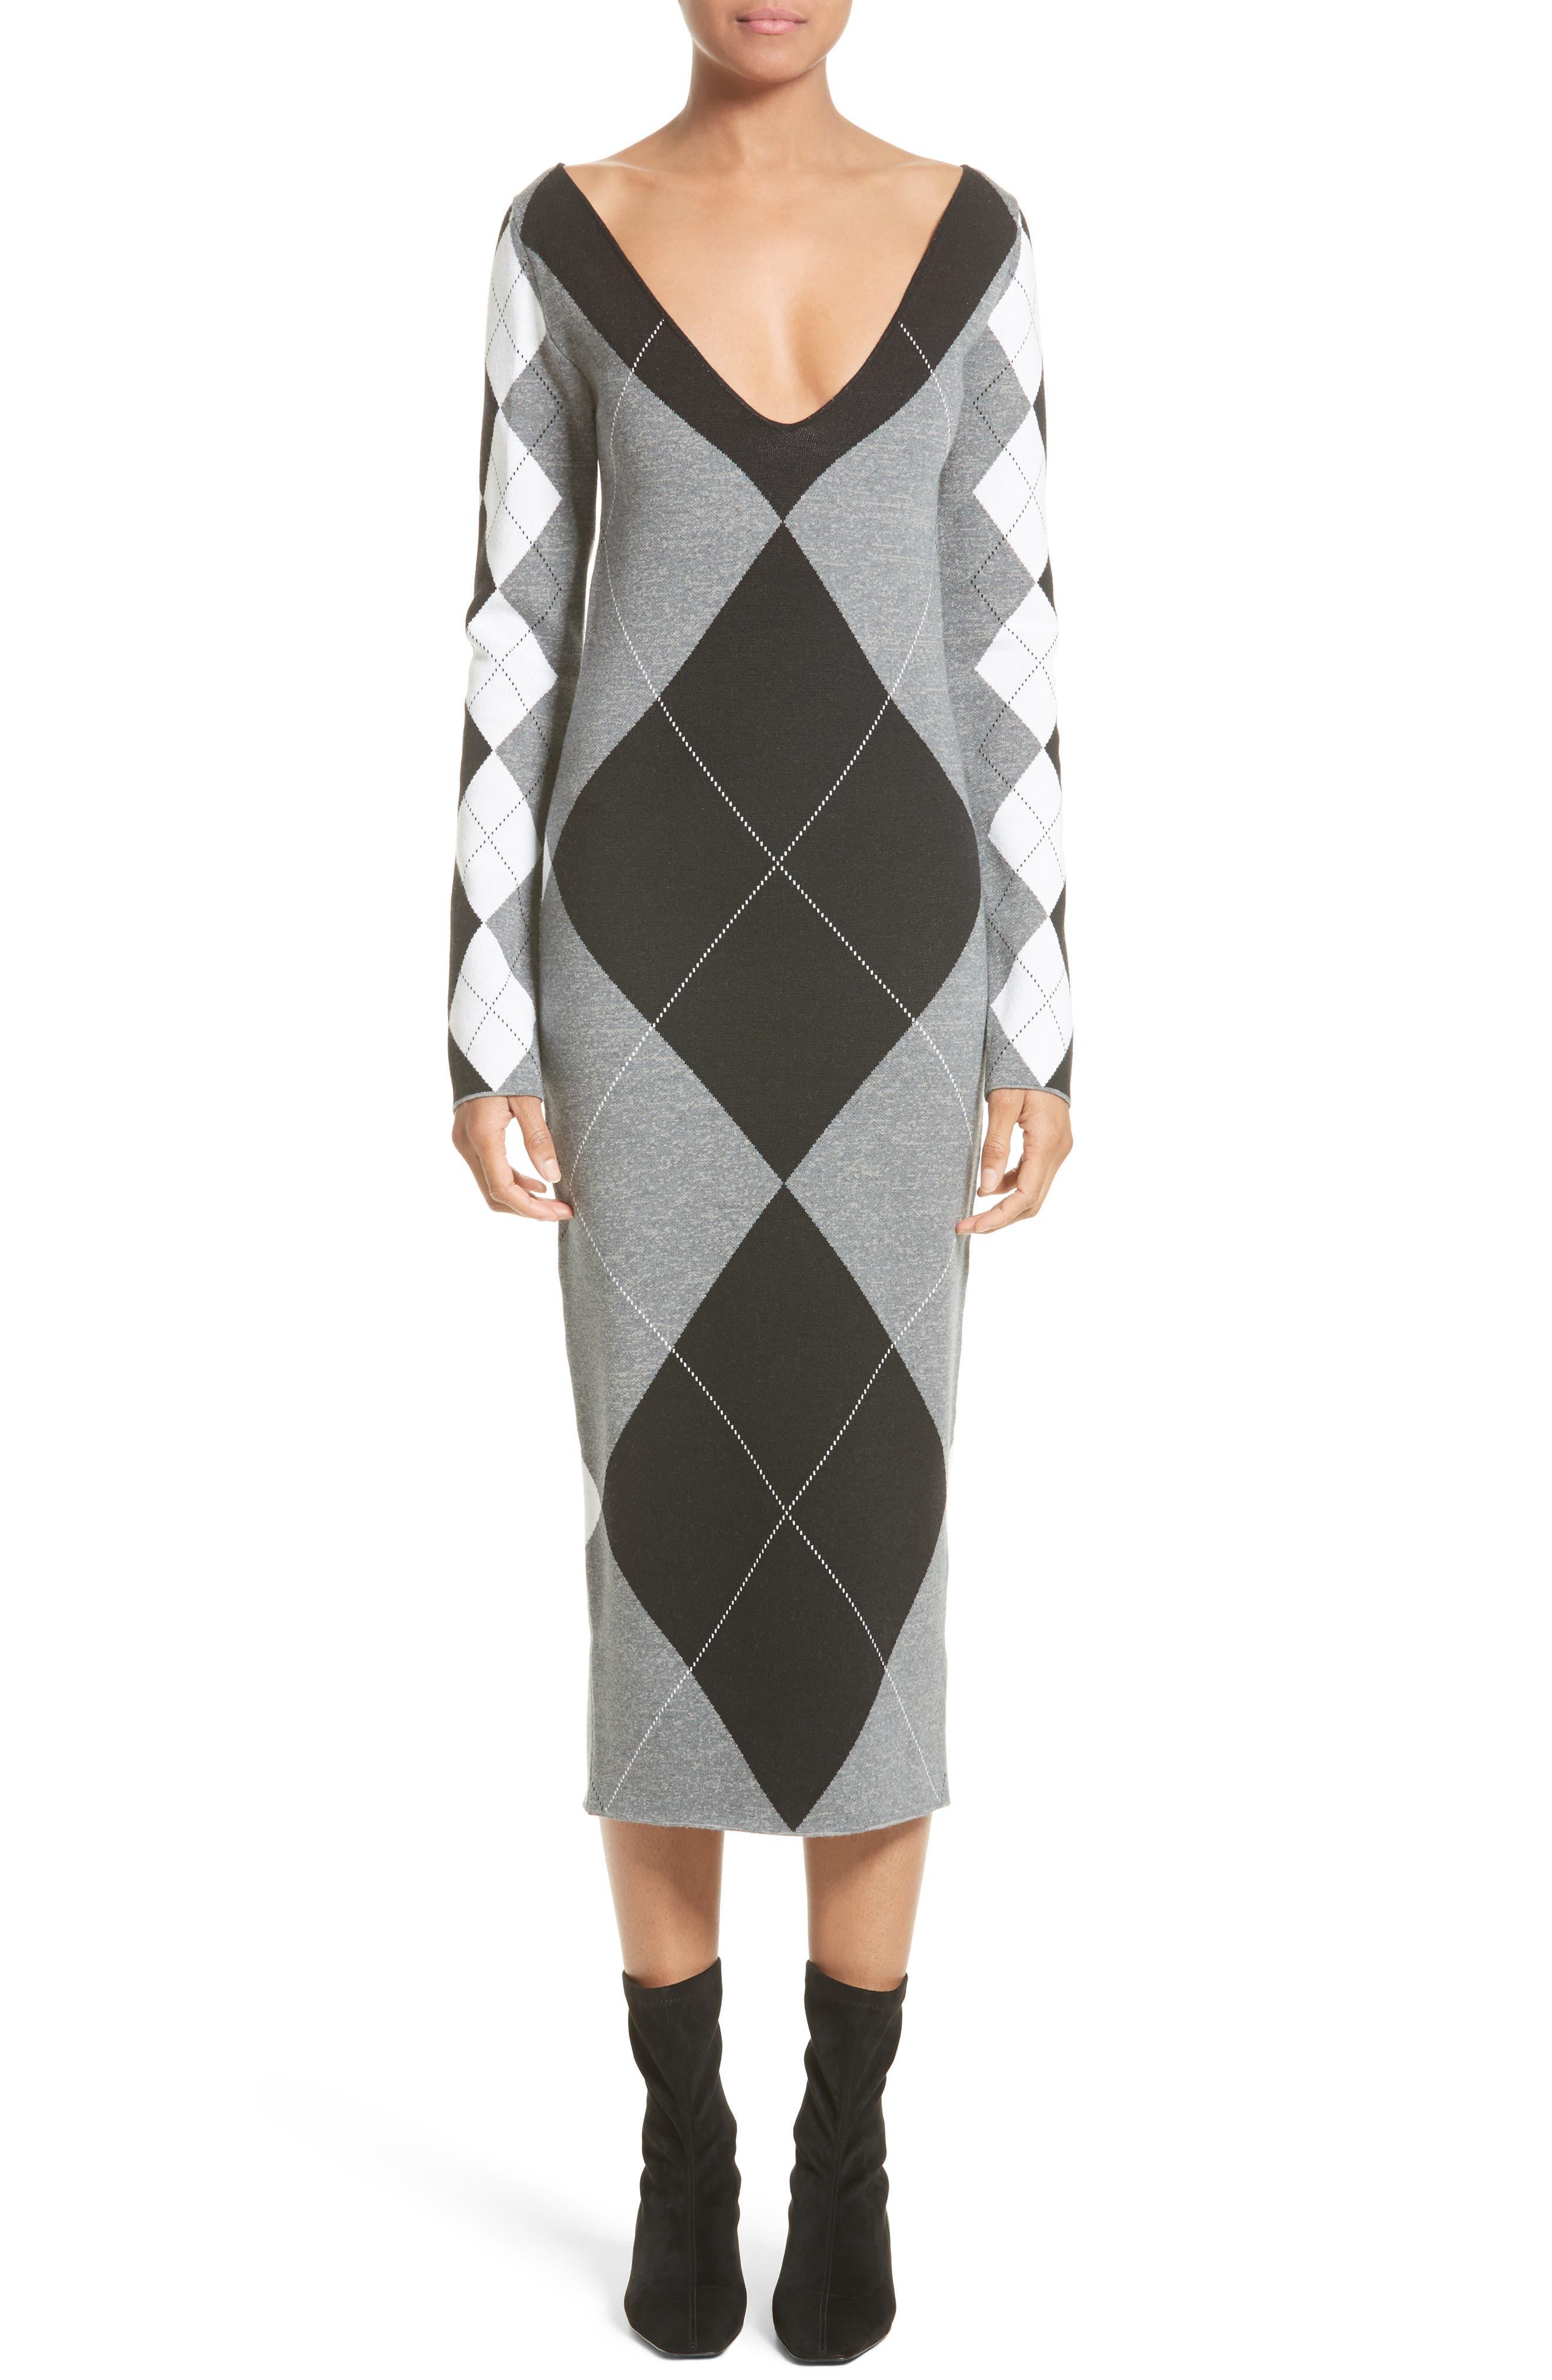 Argyle Sweater Dress,                         Main,                         color, Charcoal/ Black/ Ivory